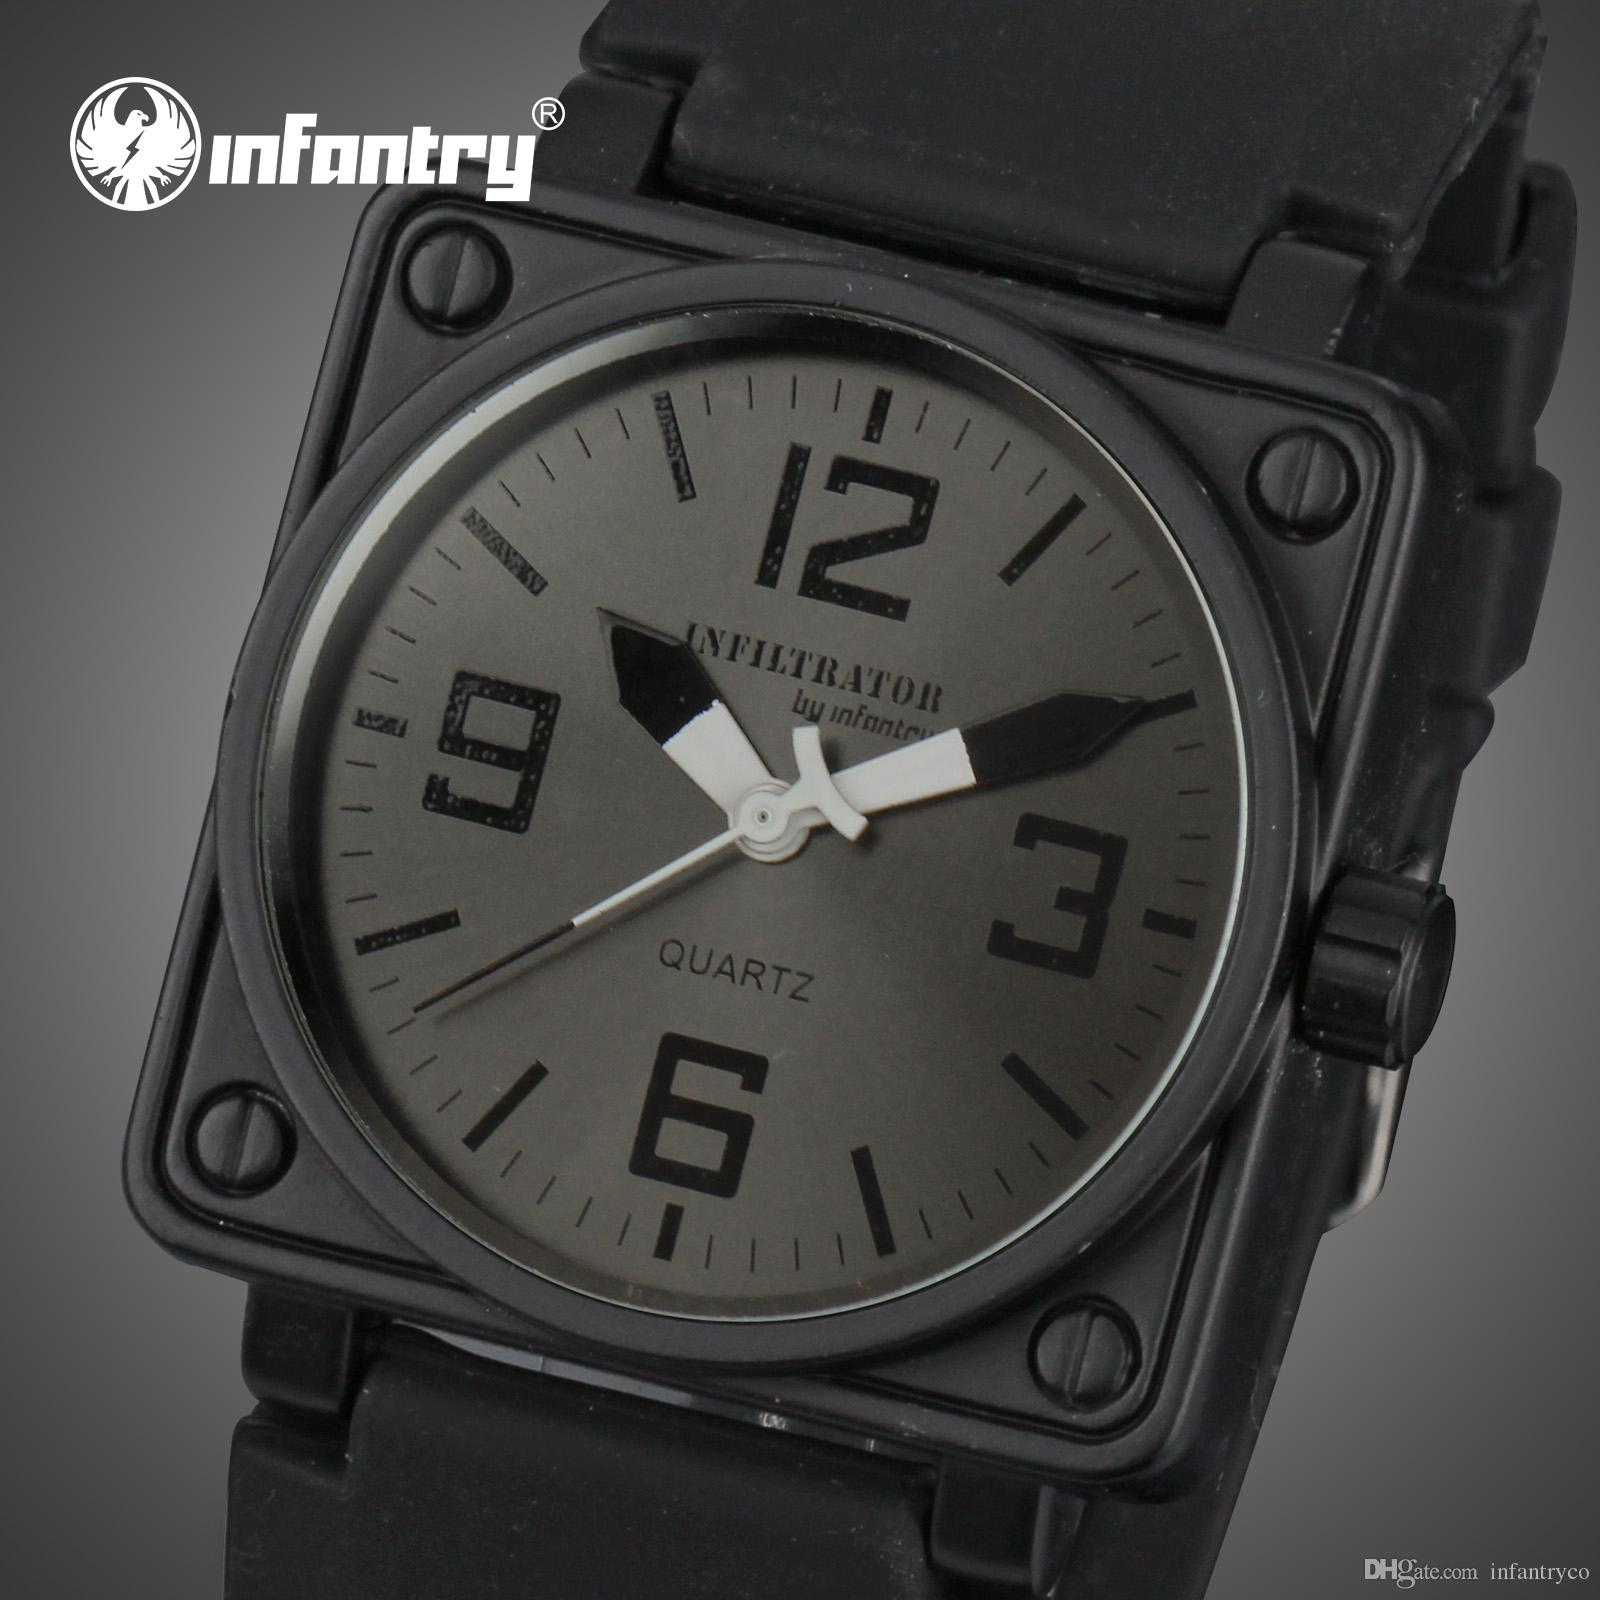 8a0399adbca Compre INFANTARIA Famoso Relógio De Marca Relógio Esportivo Dos Homens  Militares Relógios De Borracha Preta Exército Designer De Moda Casual  Relógio De ...